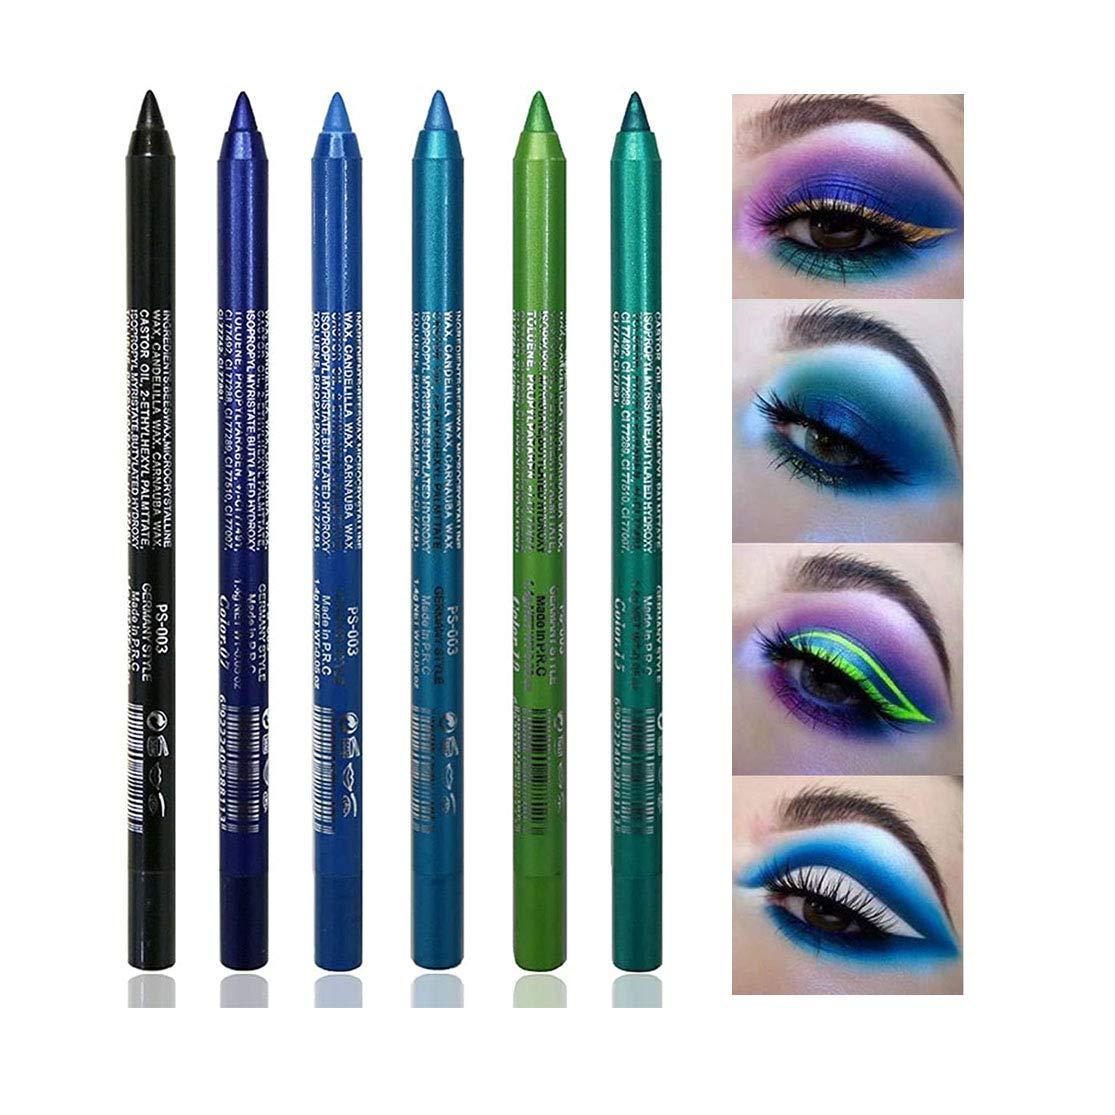 6 2021 Pcs Blue Selling and selling Eyeliner Pencil for Glitter Eye Liner women Metallic